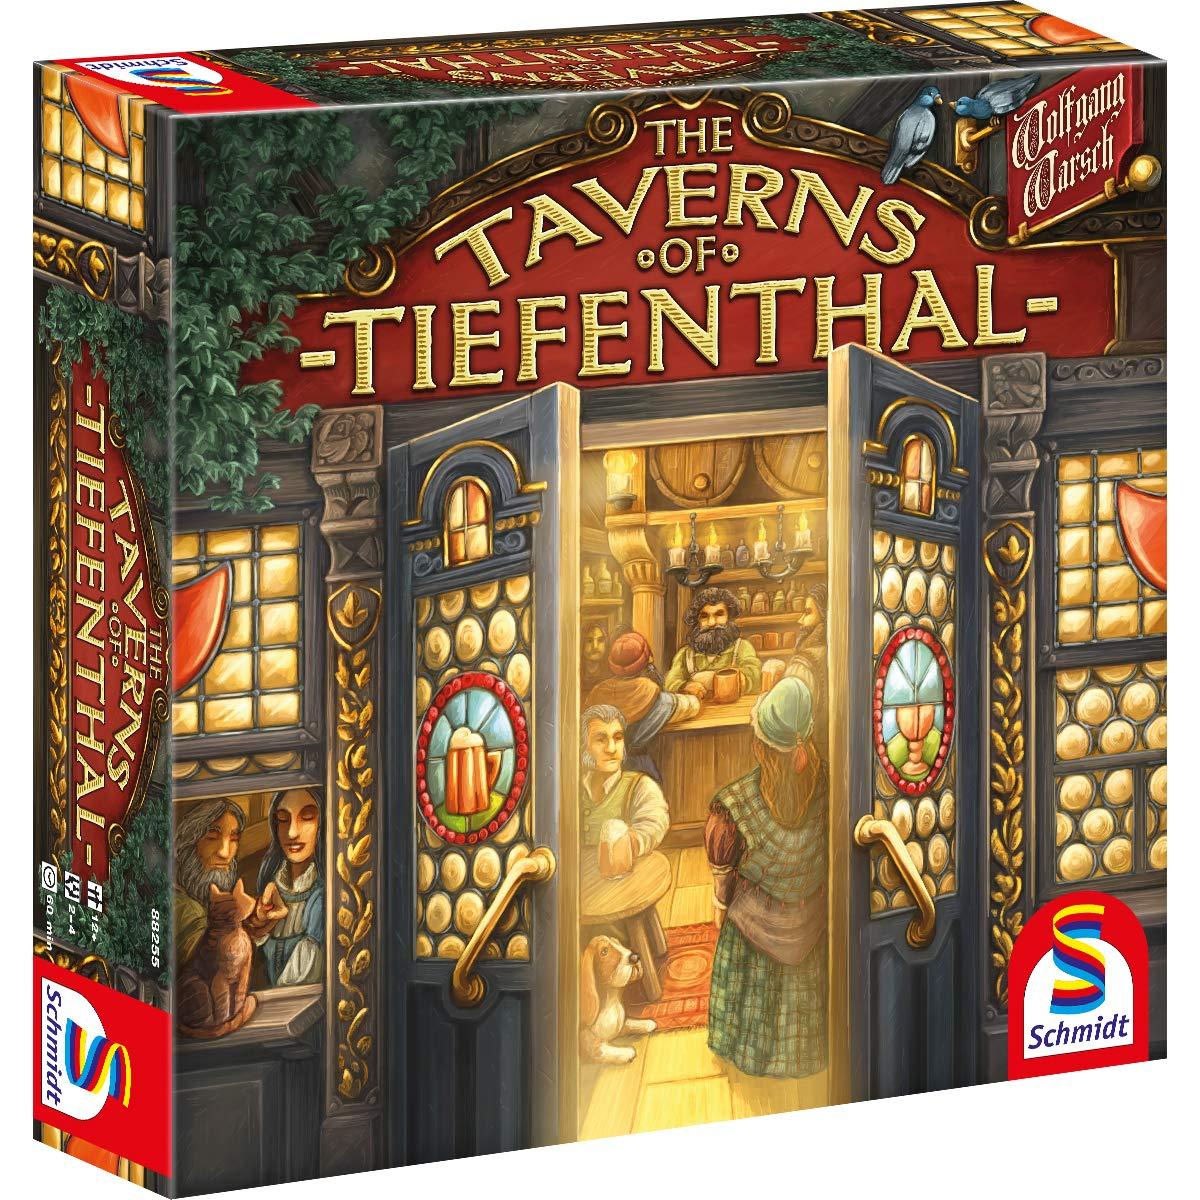 Schmidt Taverns of Tiefenthal